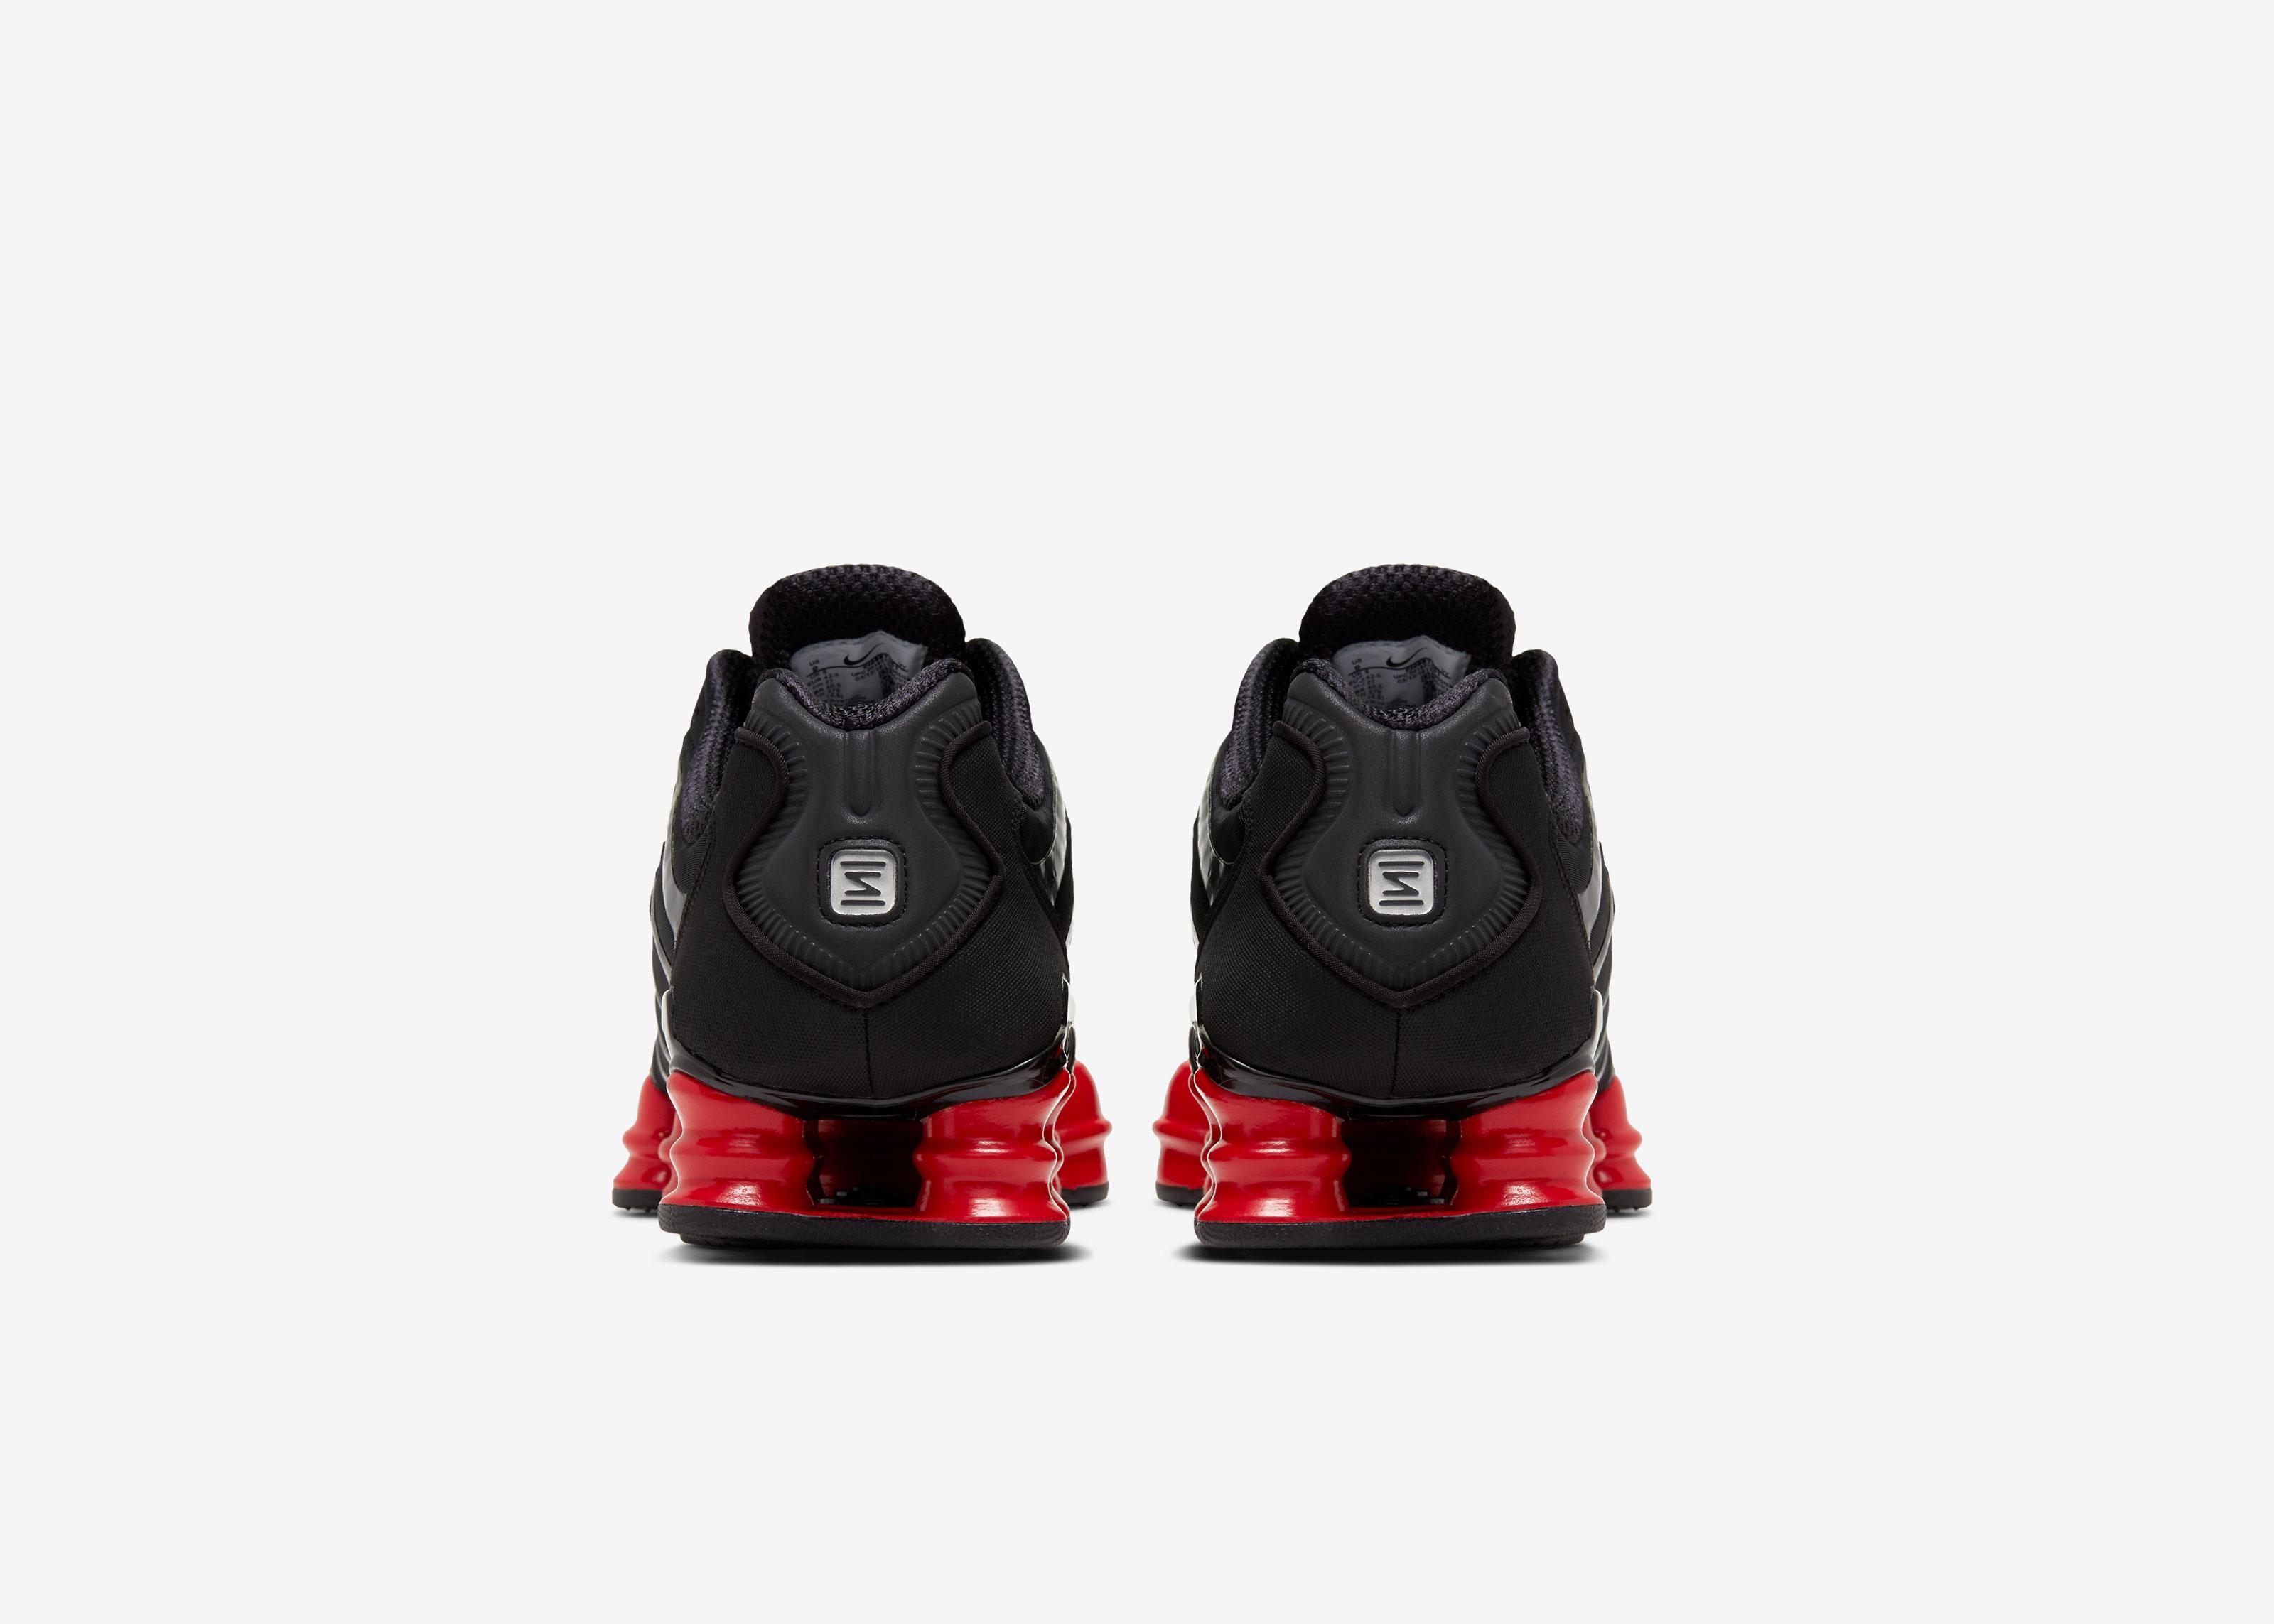 Nike SK SHOX Skepta